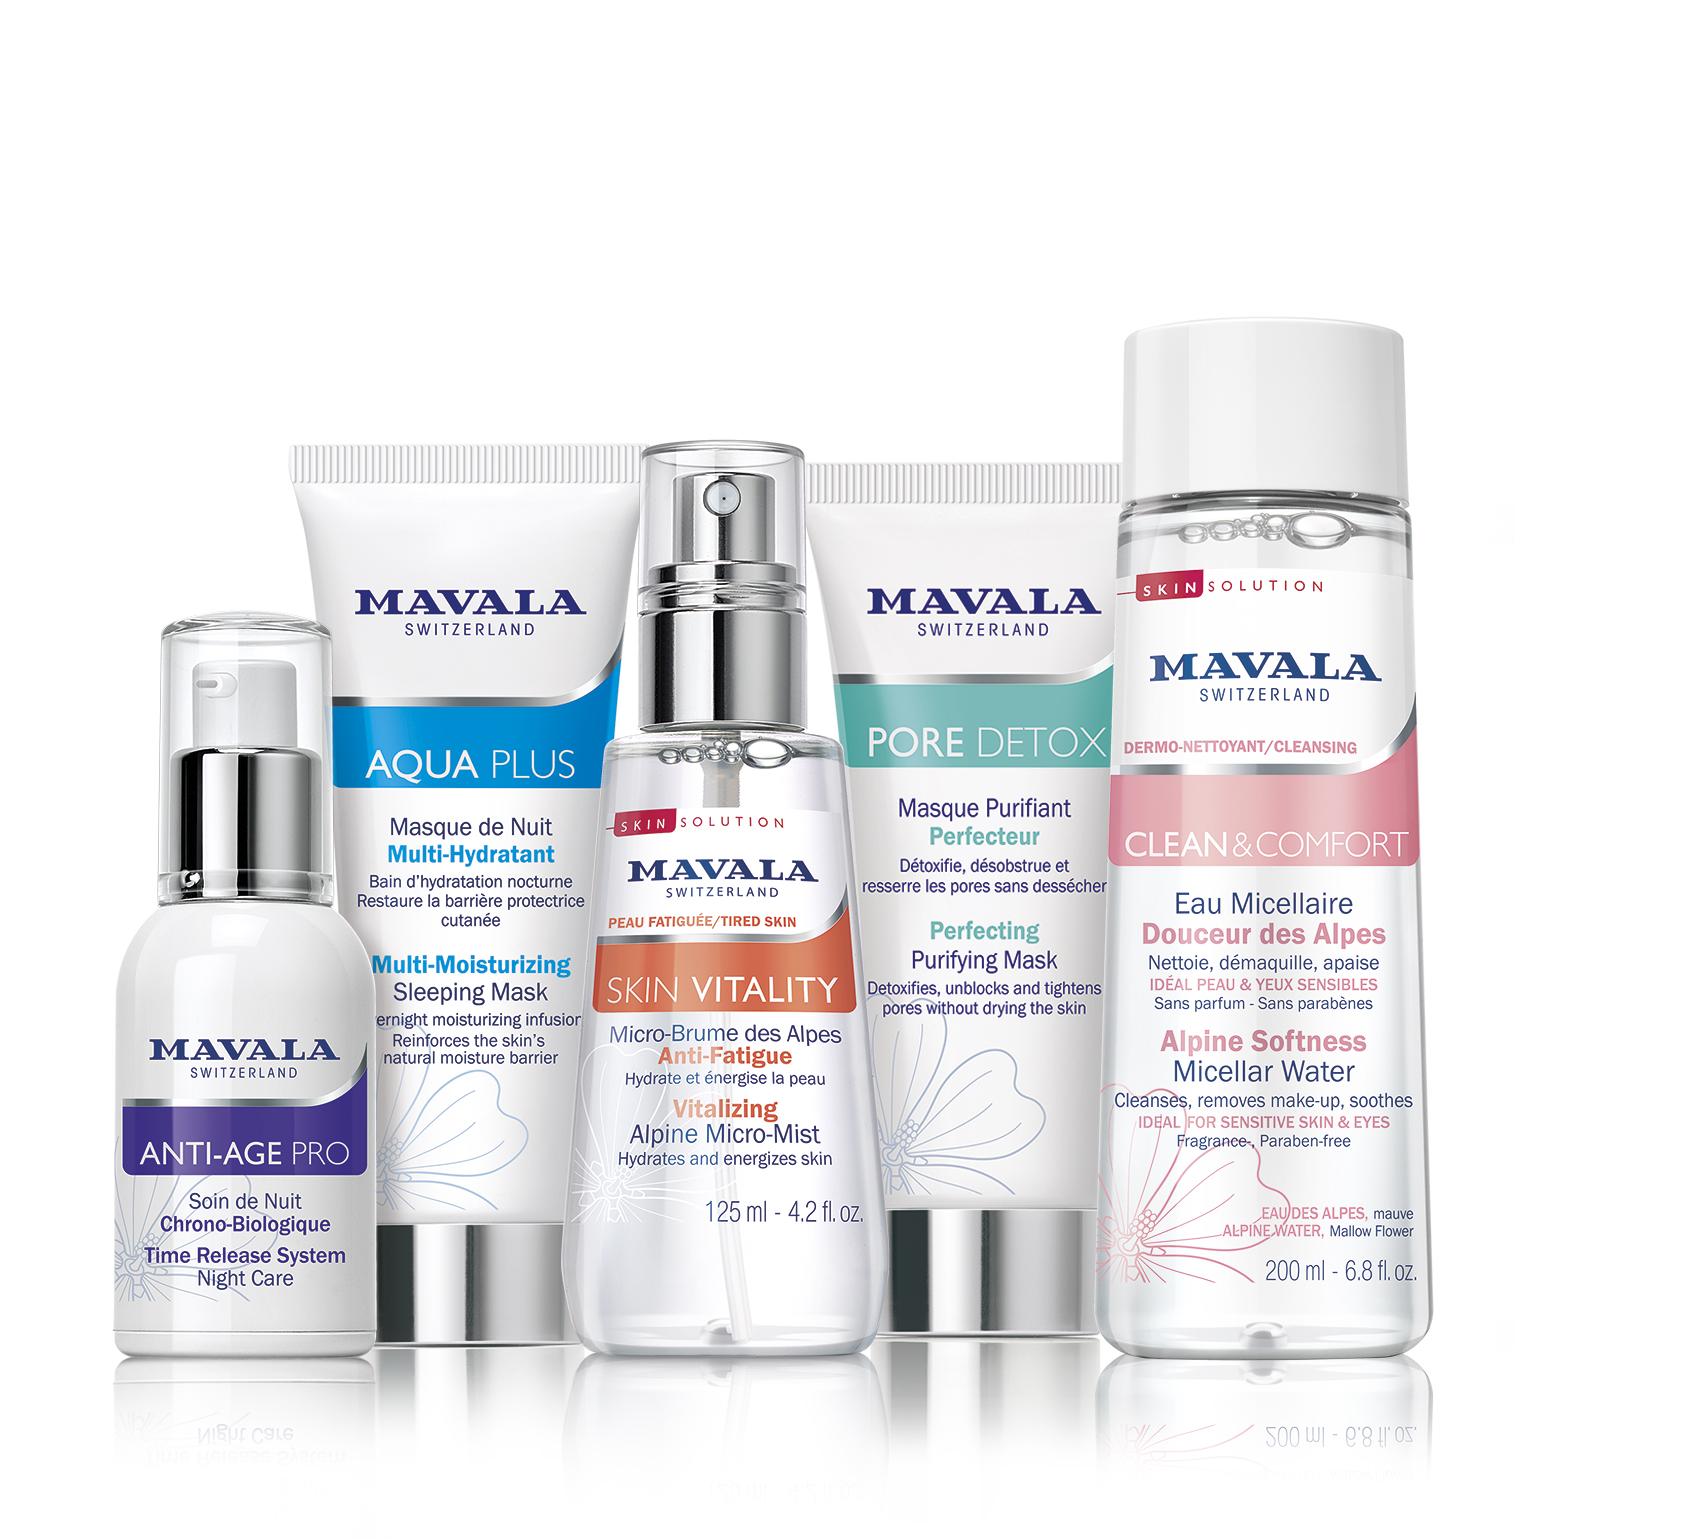 Mavala swiss skin solution gamme